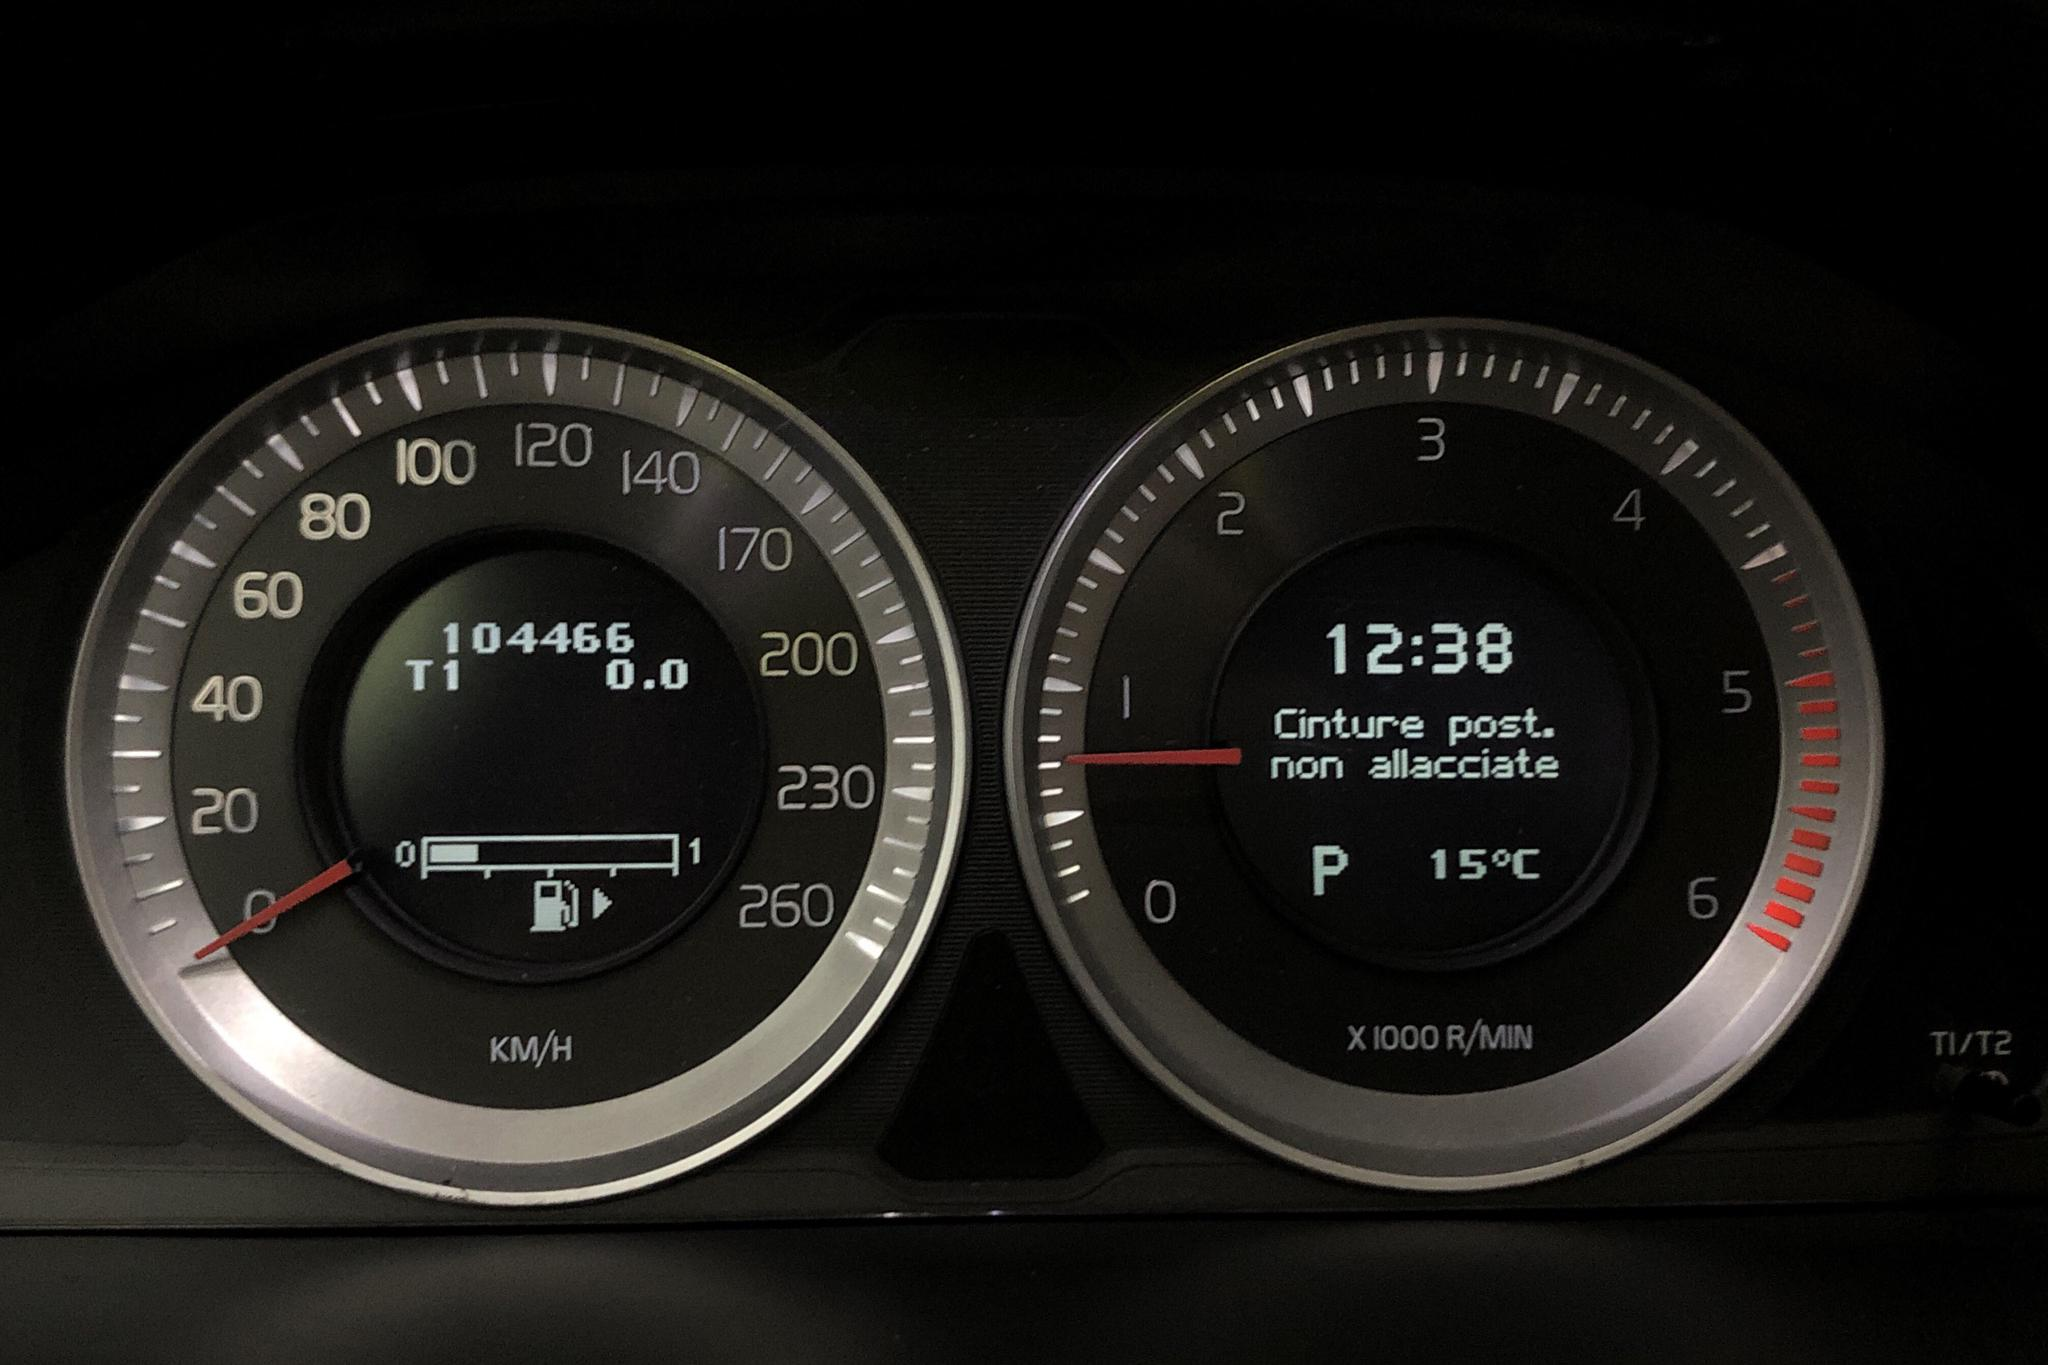 Volvo V60 D3 (163hk) - 104 460 km - Automatic - black - 2012